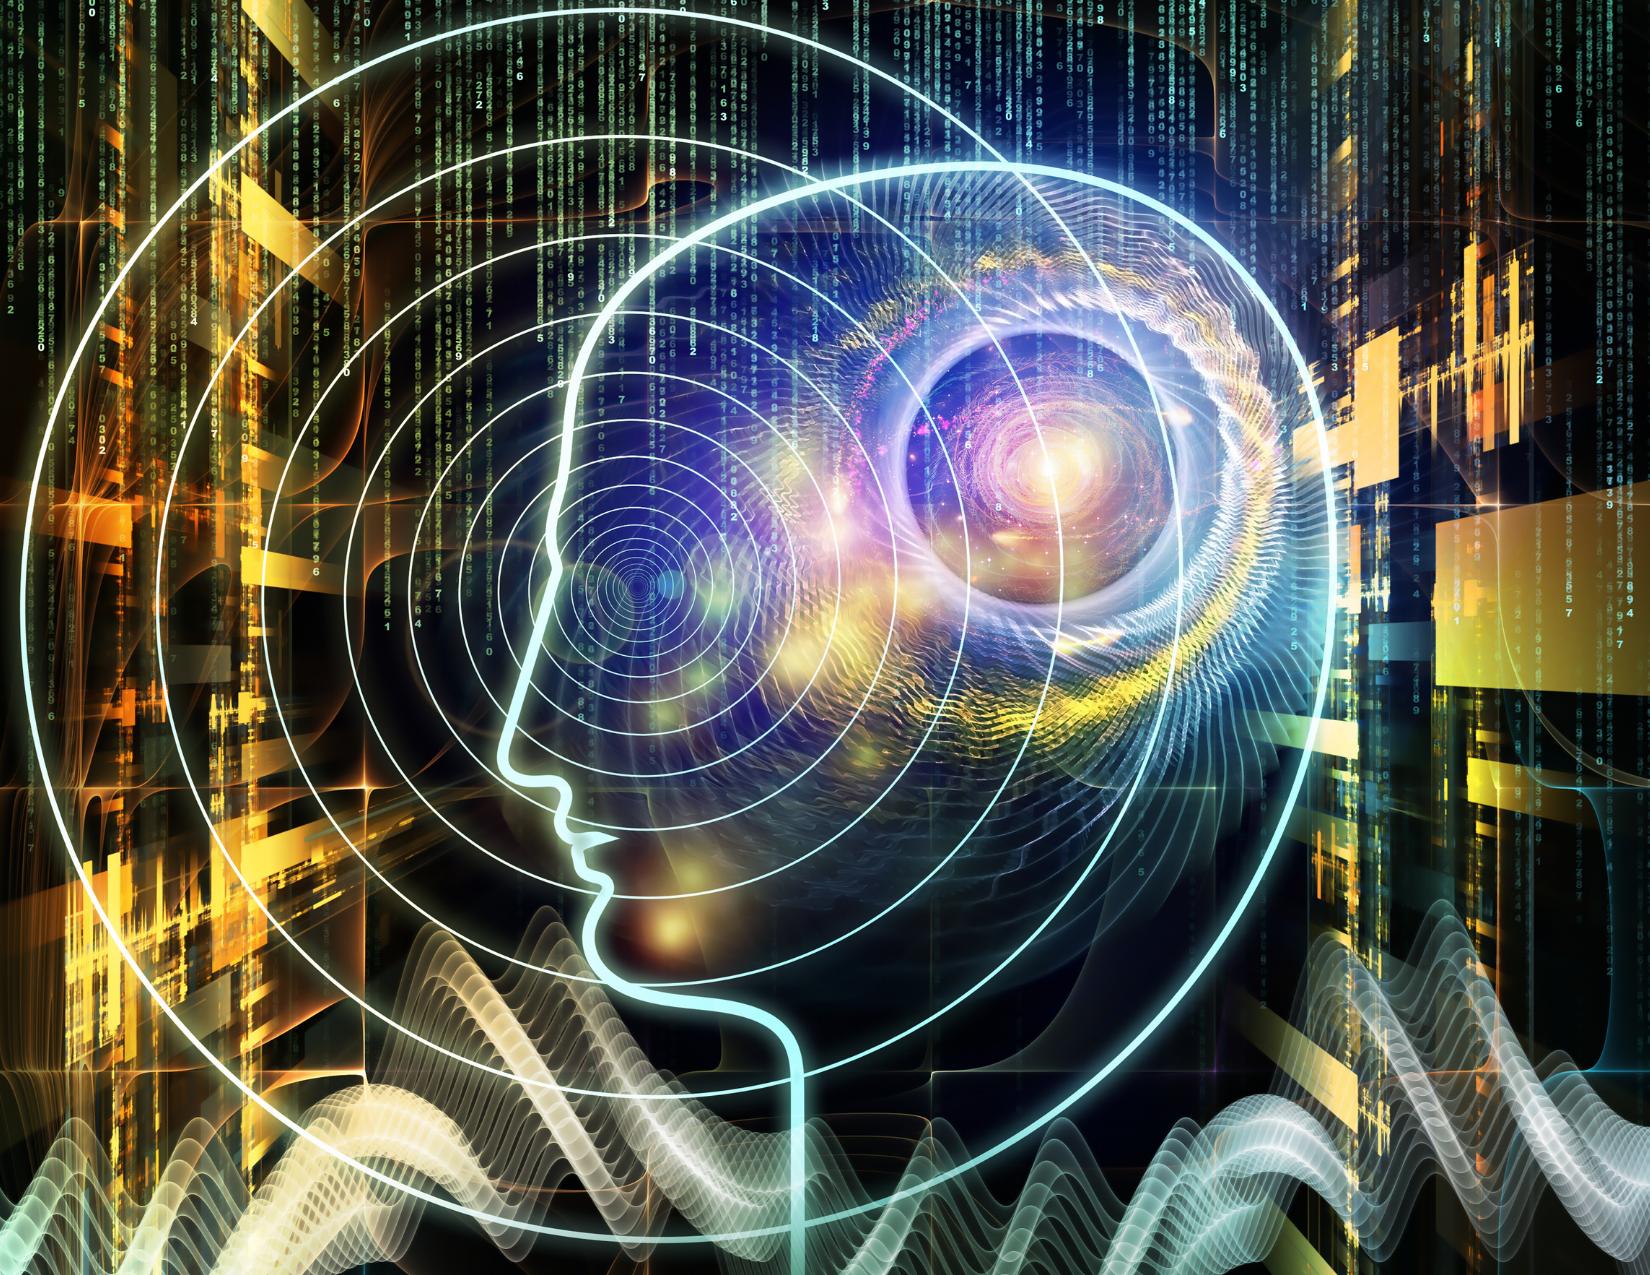 Leap In Consciousness — Gradual or Sudden?